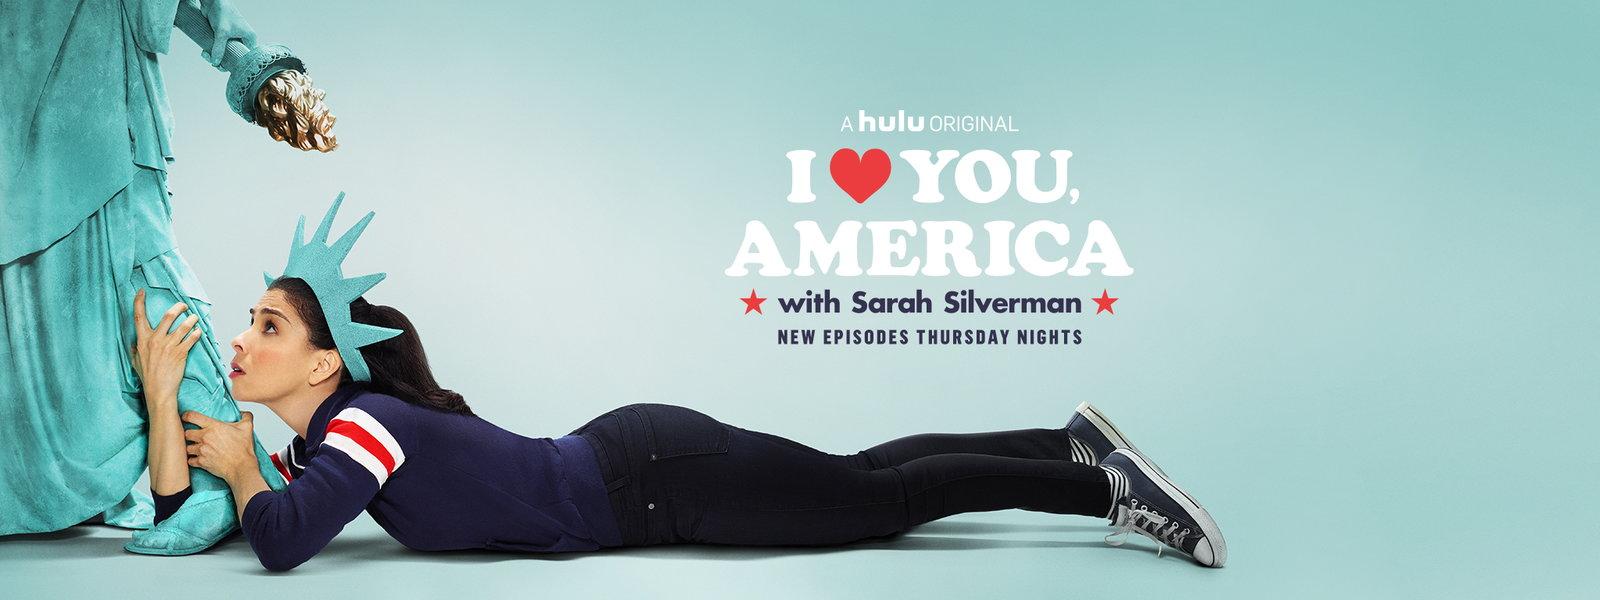 Hulu Original Sarah Silverman.jpg